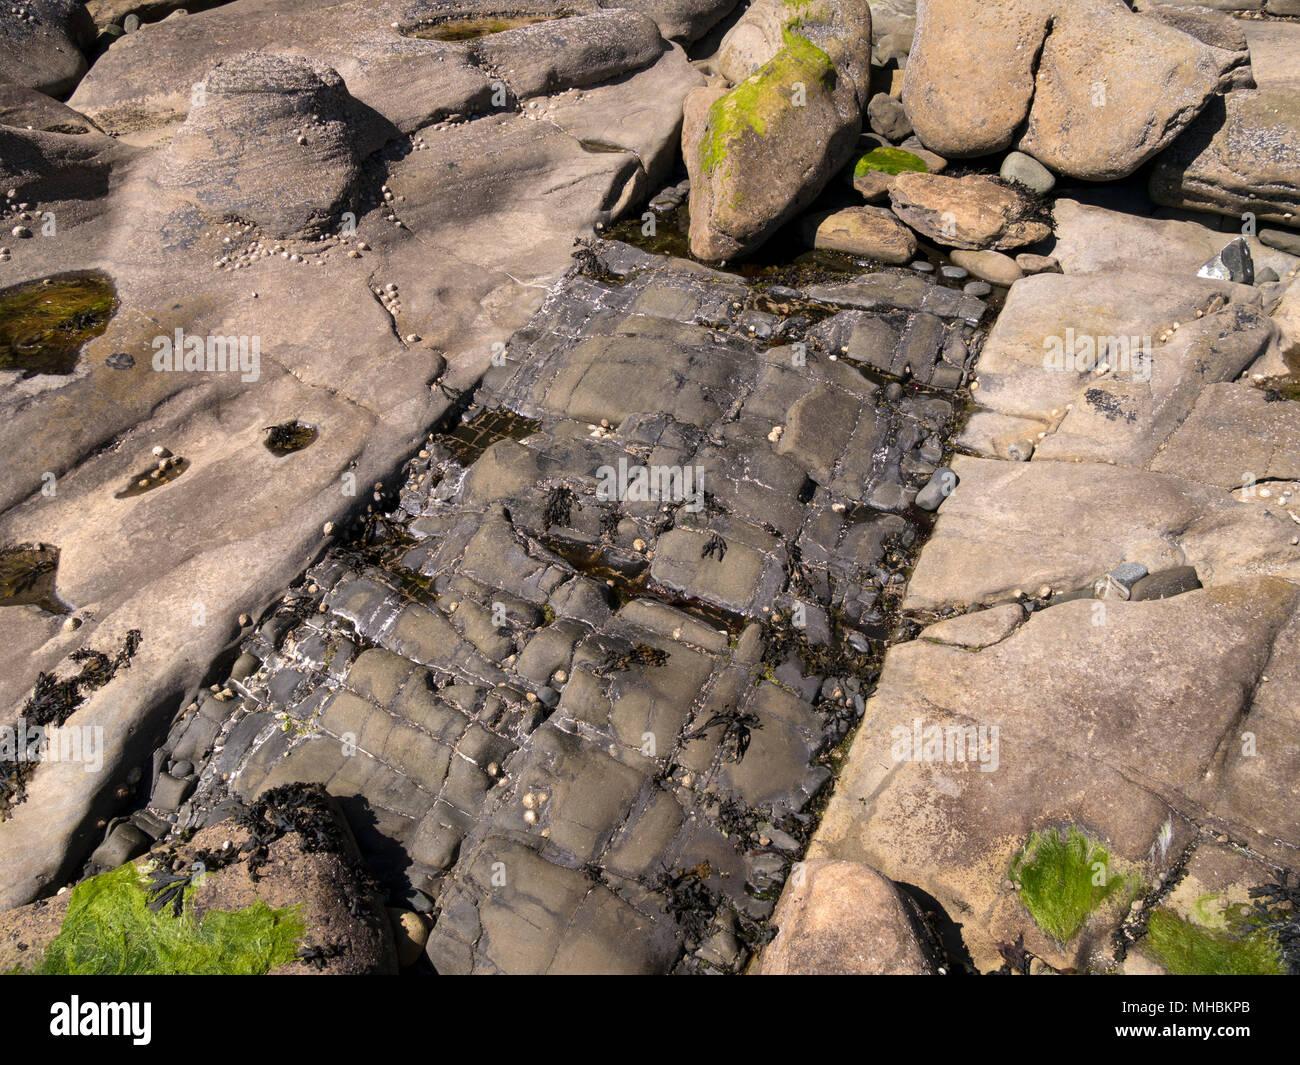 Seam of basalt igneous intrusion in beach rocks, Glasnakille, Isle of Skye, Scotland, UK - Stock Image